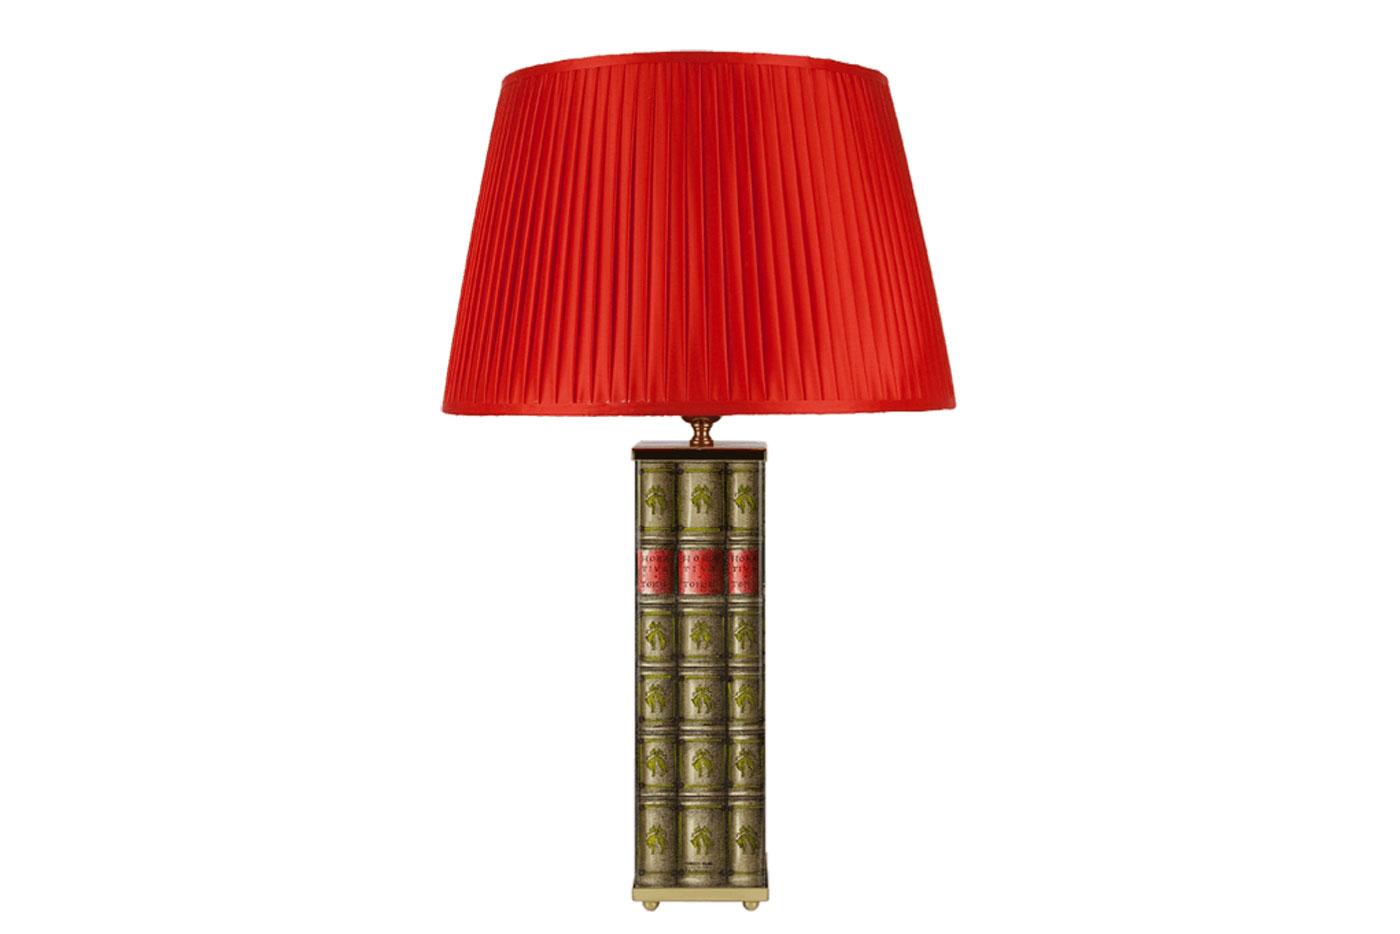 Lampada-Fornasetti-img-post